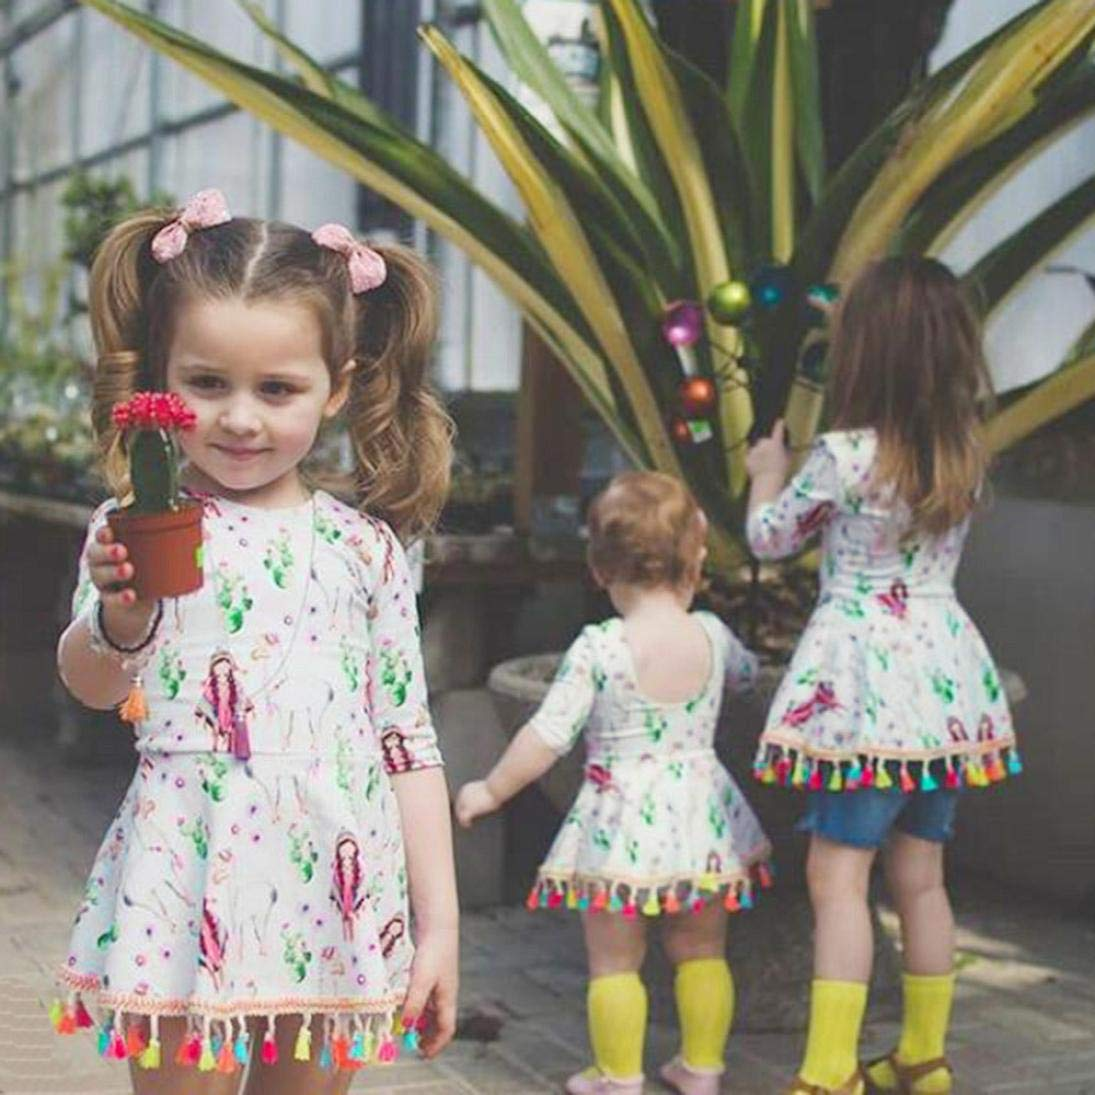 Halloween Kid Dress,Fineser Toddler Kid Baby Girl Dress Backless Tassel Cartoon Print Dresses Halloween Party Outfits